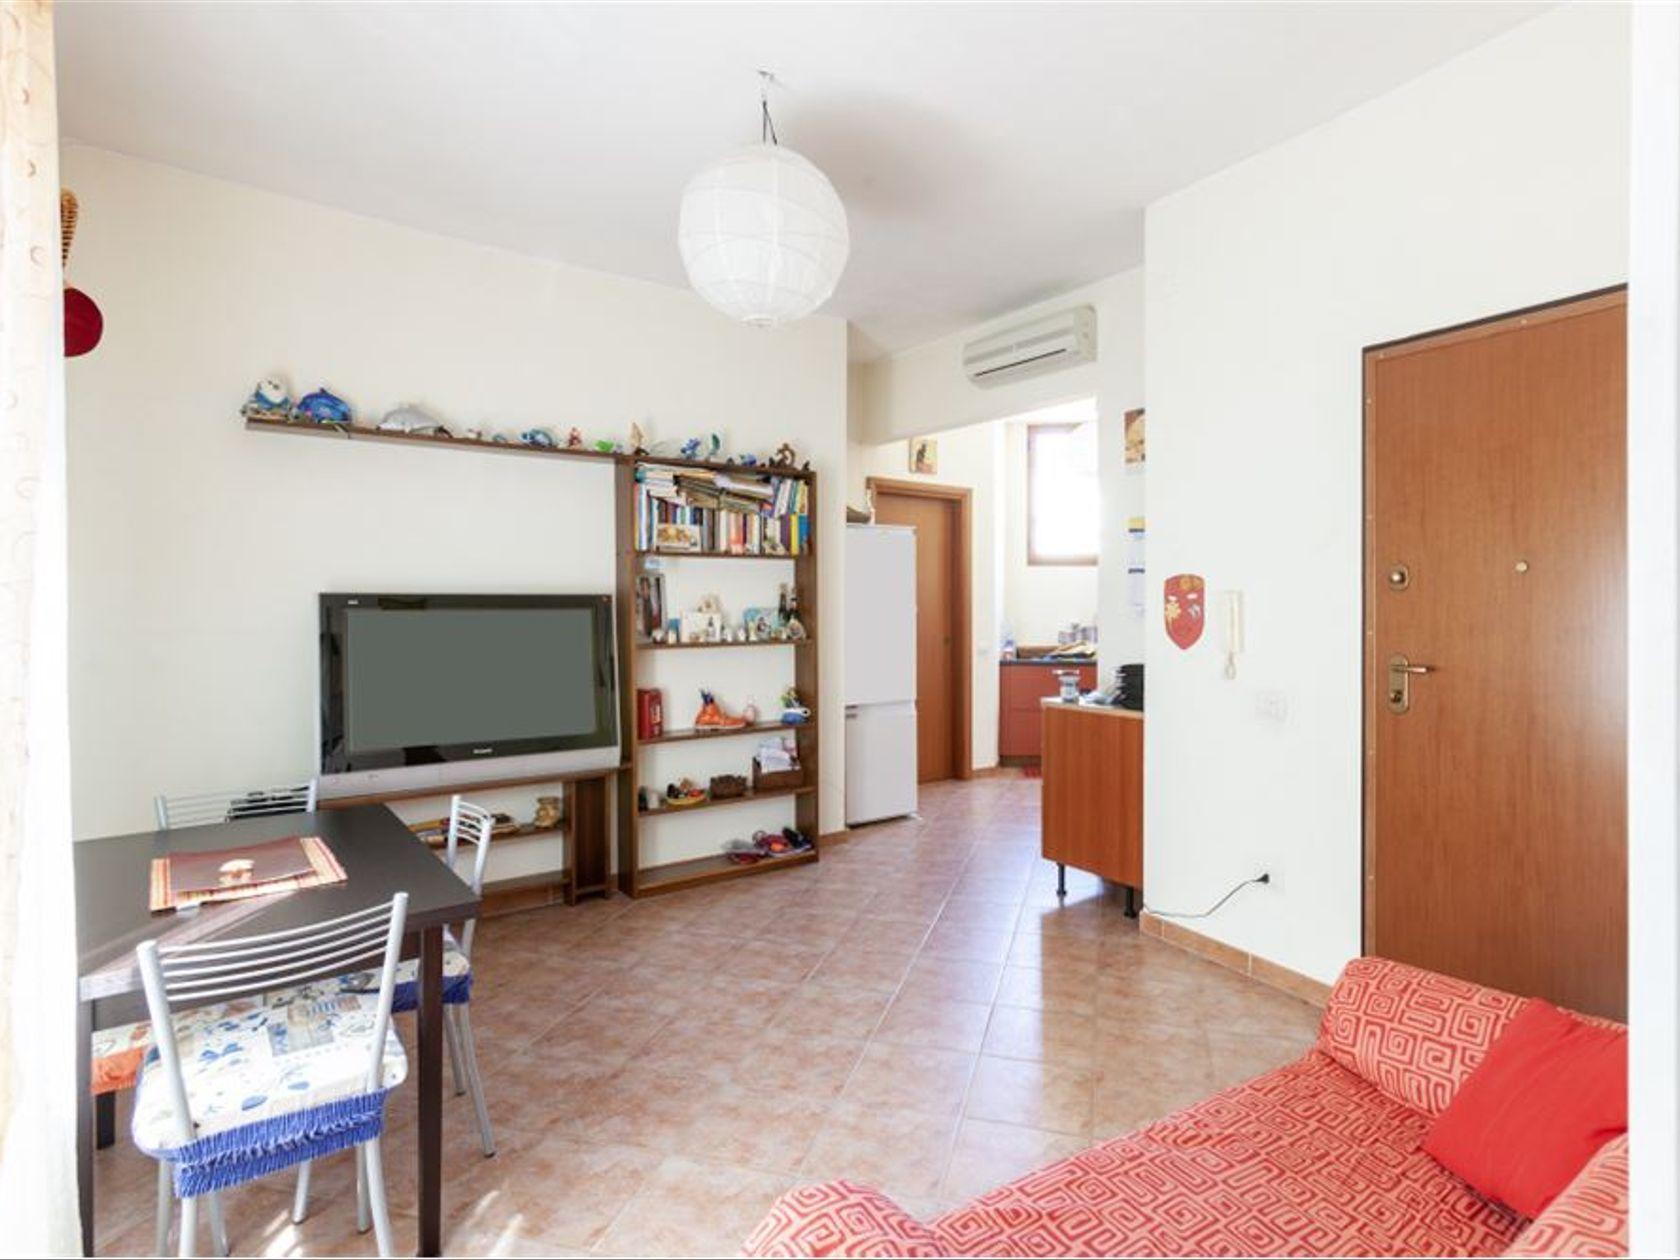 Appartamento Zona Centro, Quartu Sant'Elena, CA Vendita - Foto 12